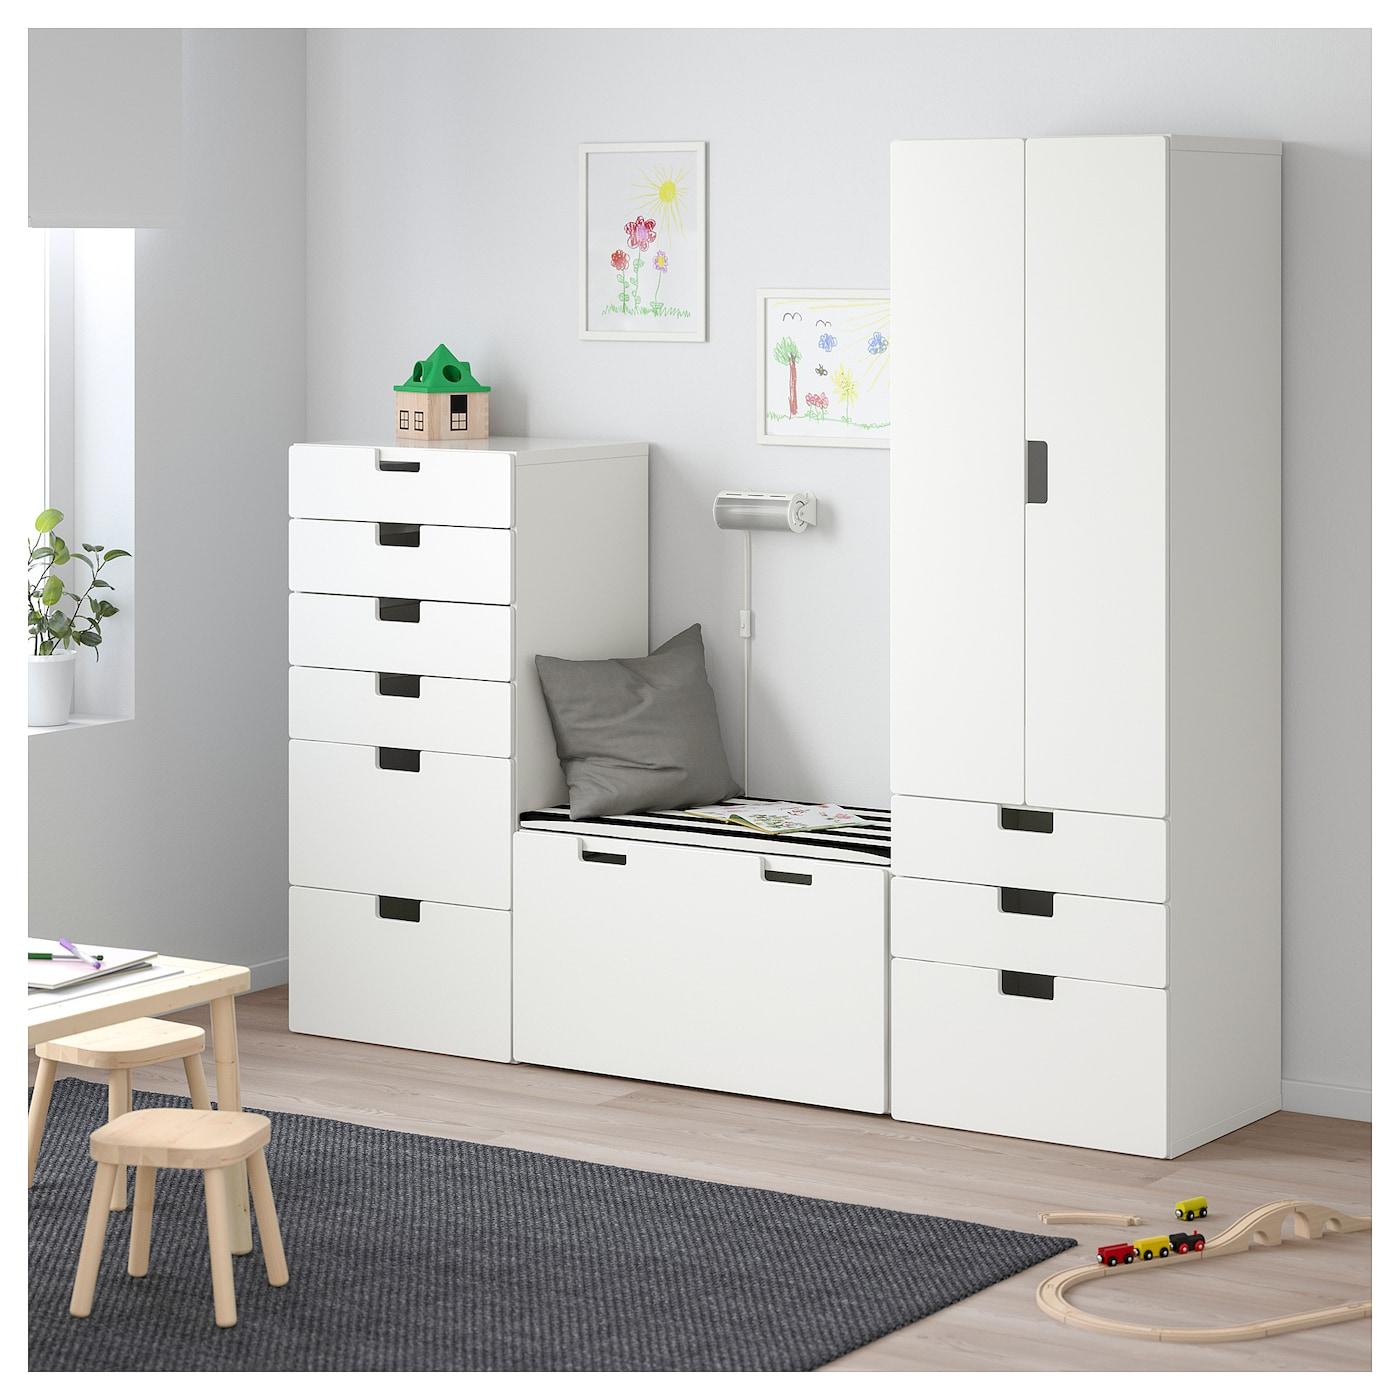 stuva combinaison de rangement blanc blanc 210x50x192 cm ikea. Black Bedroom Furniture Sets. Home Design Ideas